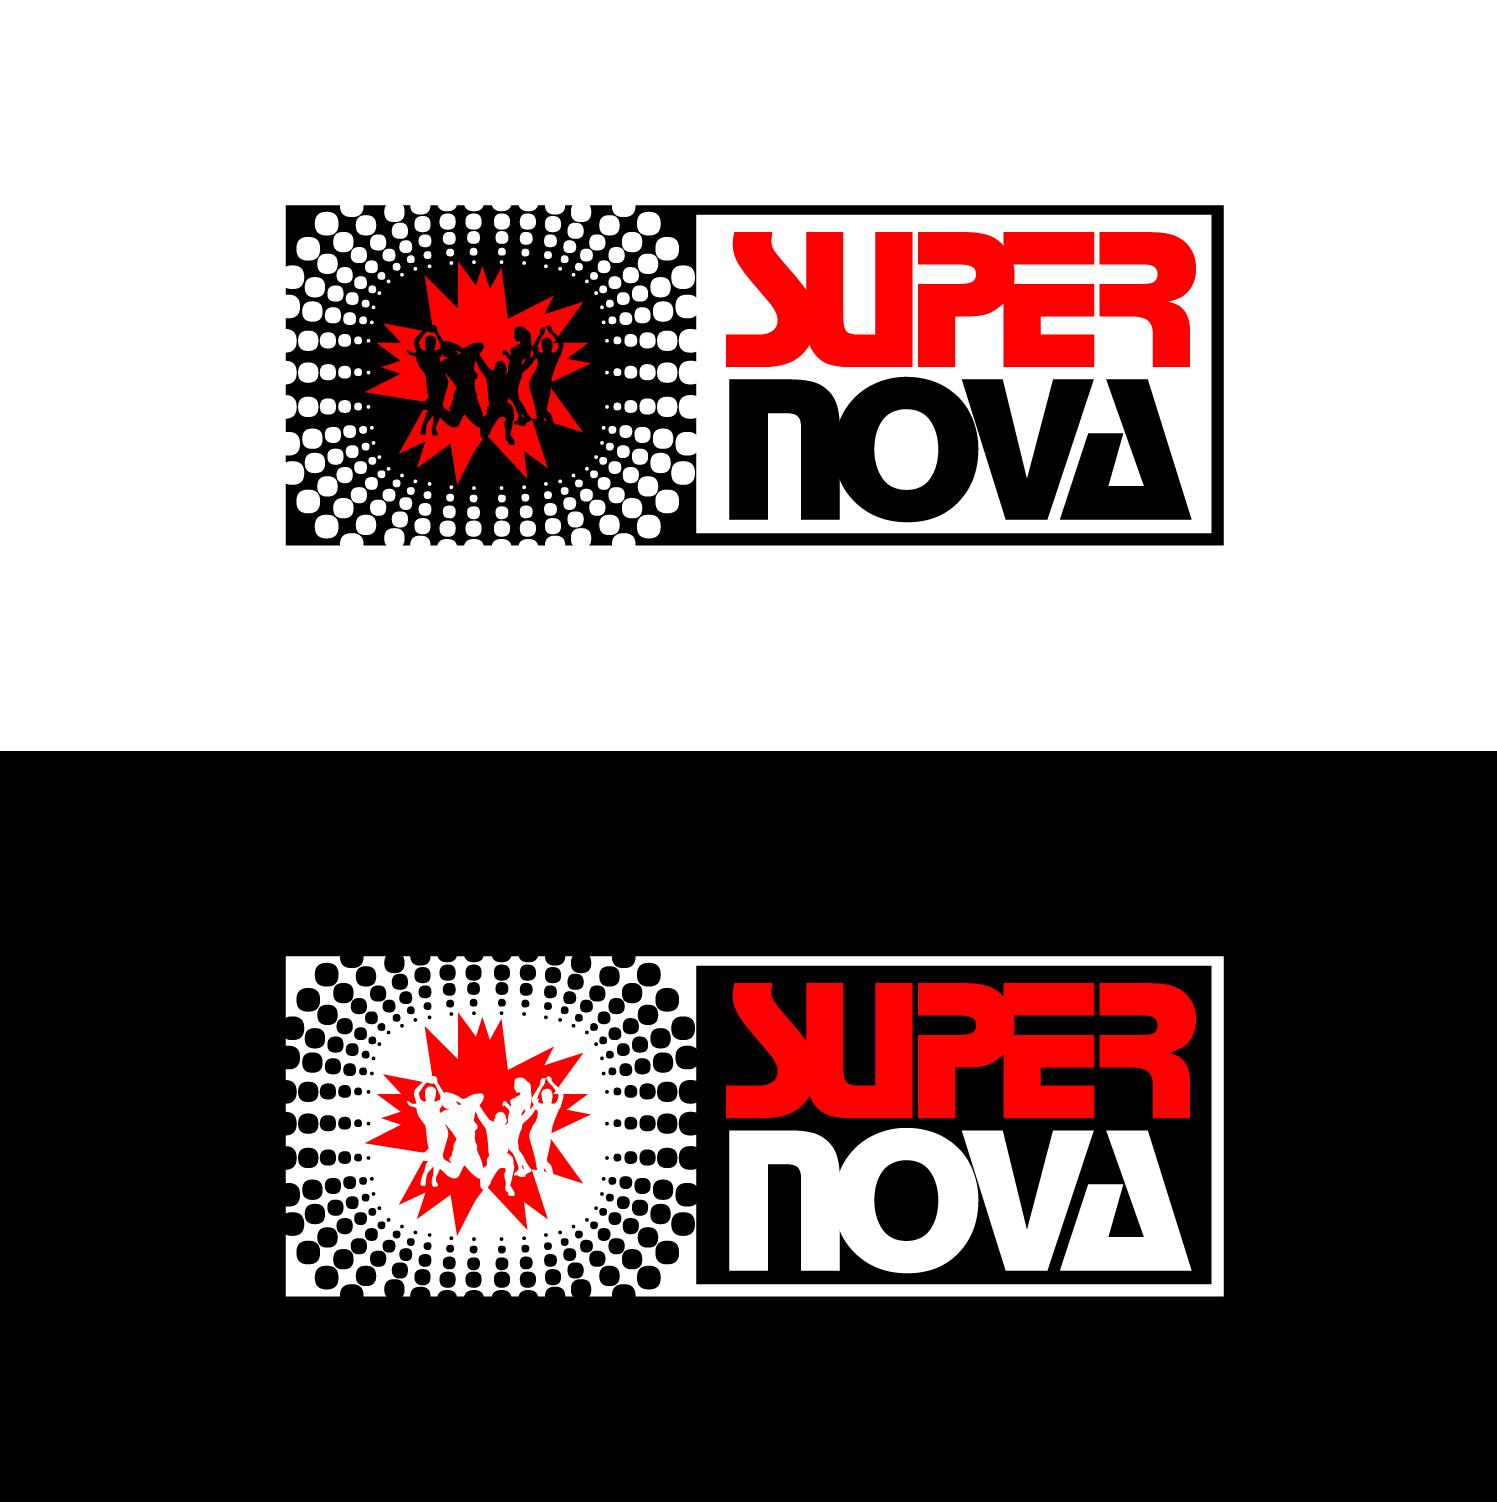 Logo Design by Batter Fly - Entry No. 246 in the Logo Design Contest Creative Logo Design for Supernova.